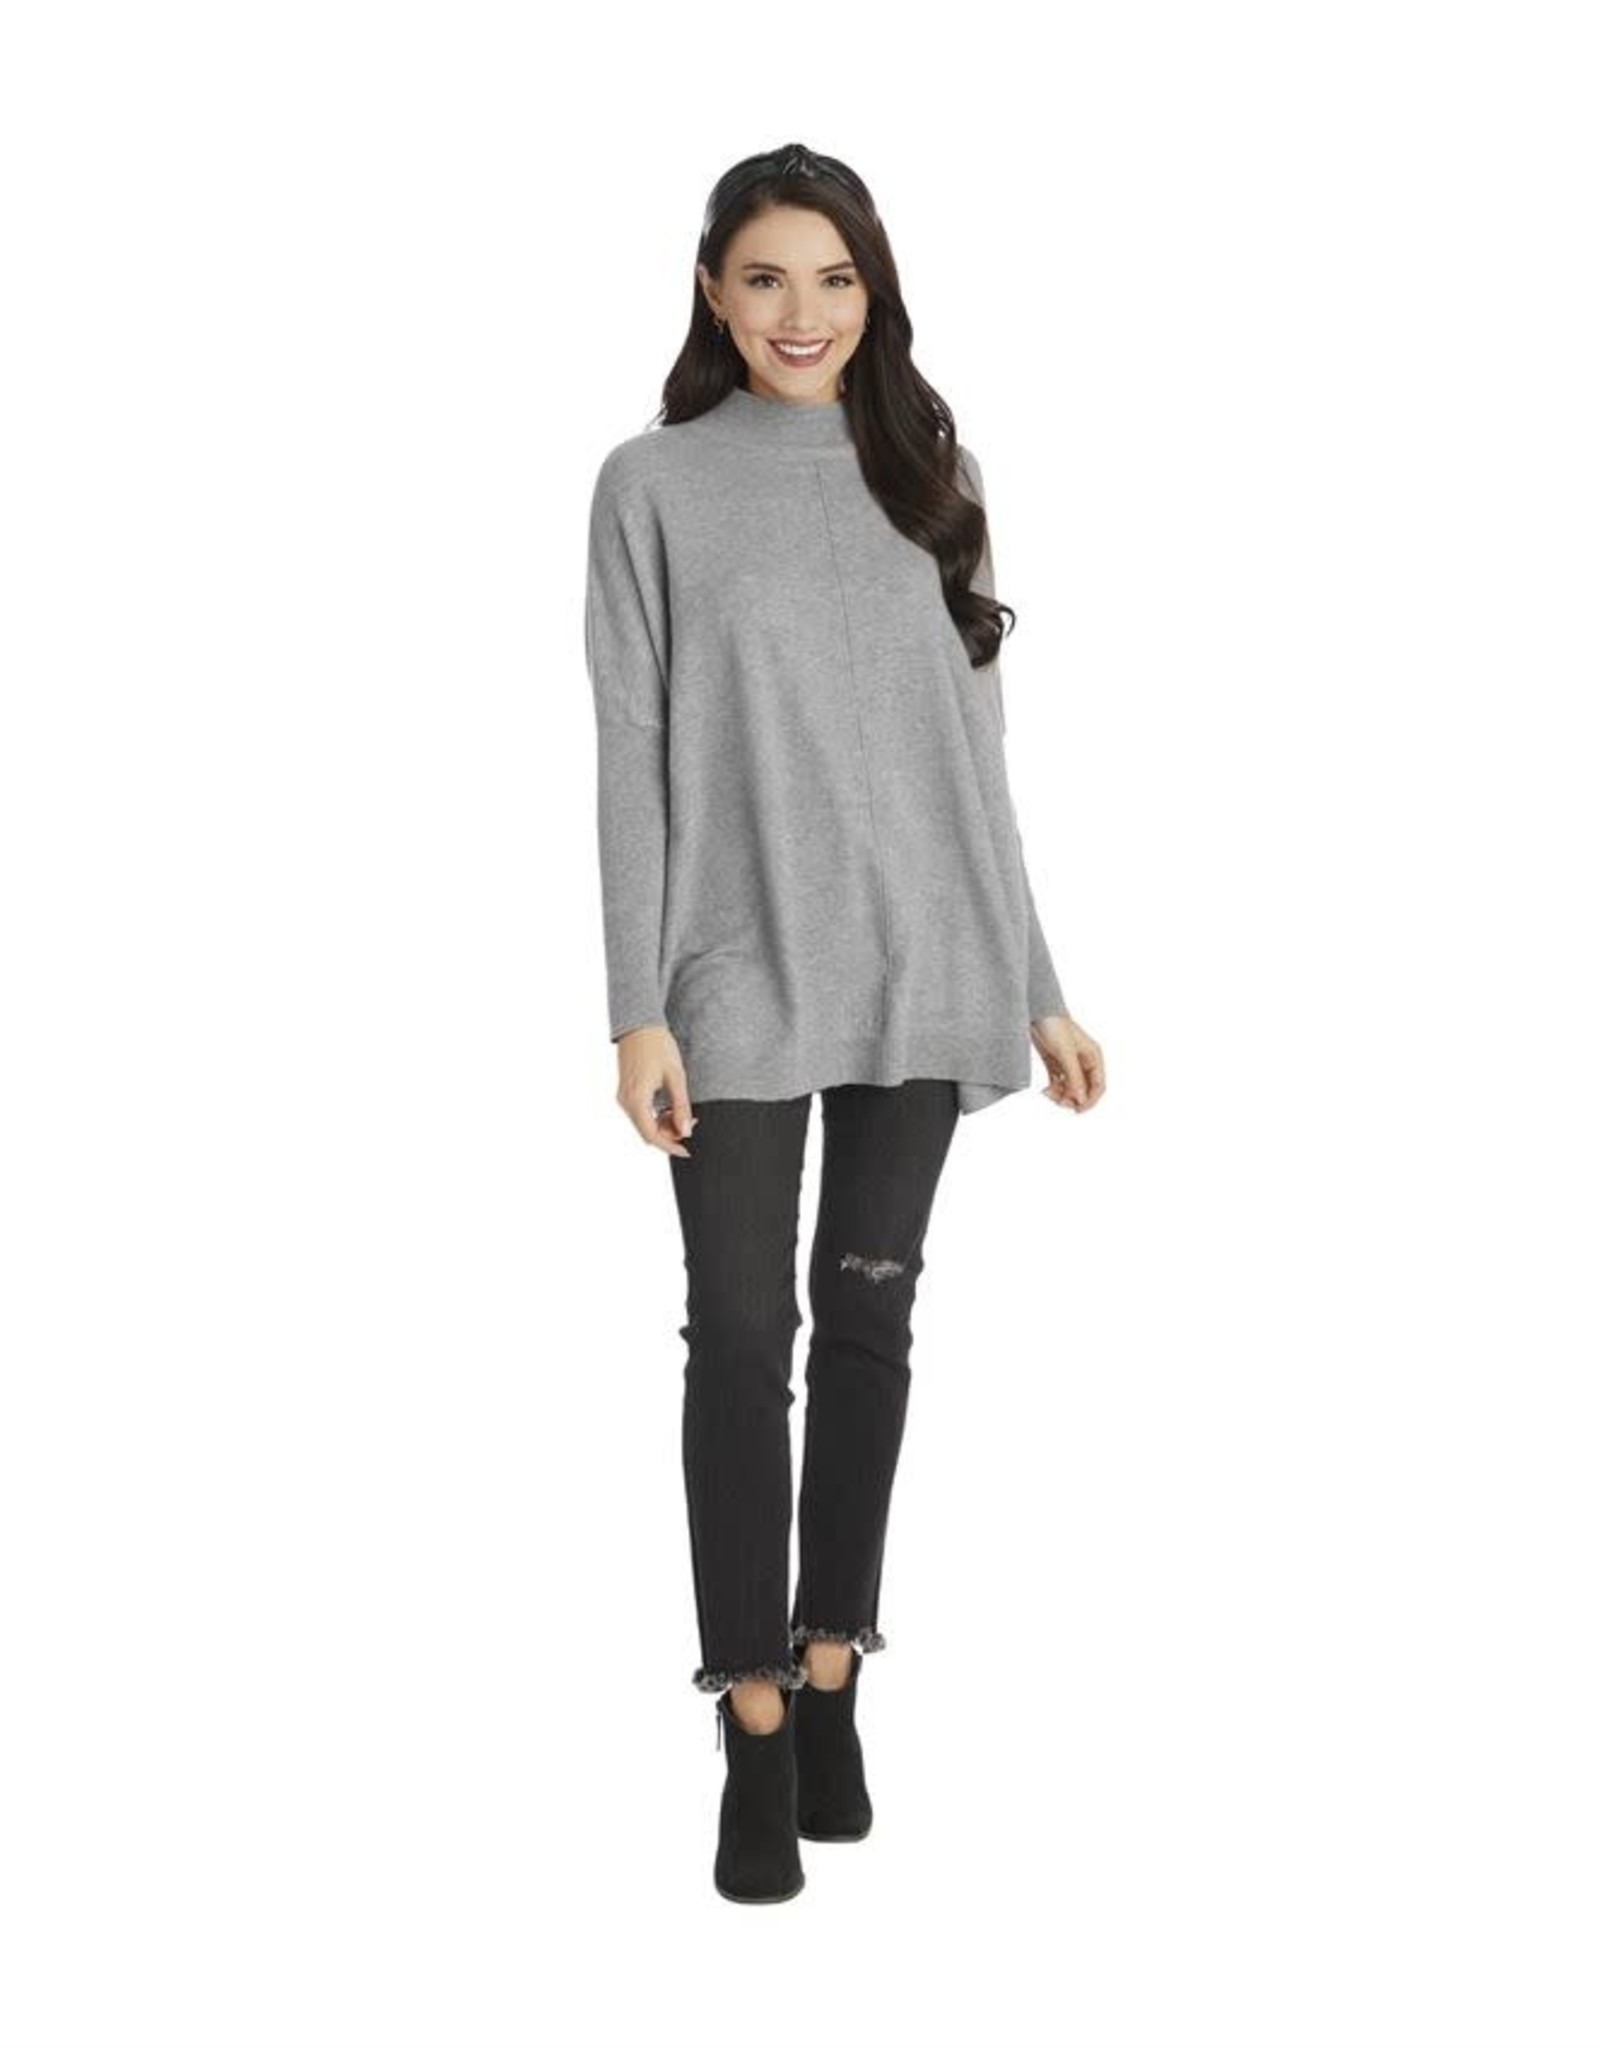 MudPie MudPie Ellis Mock Neck Sweater (O/S)